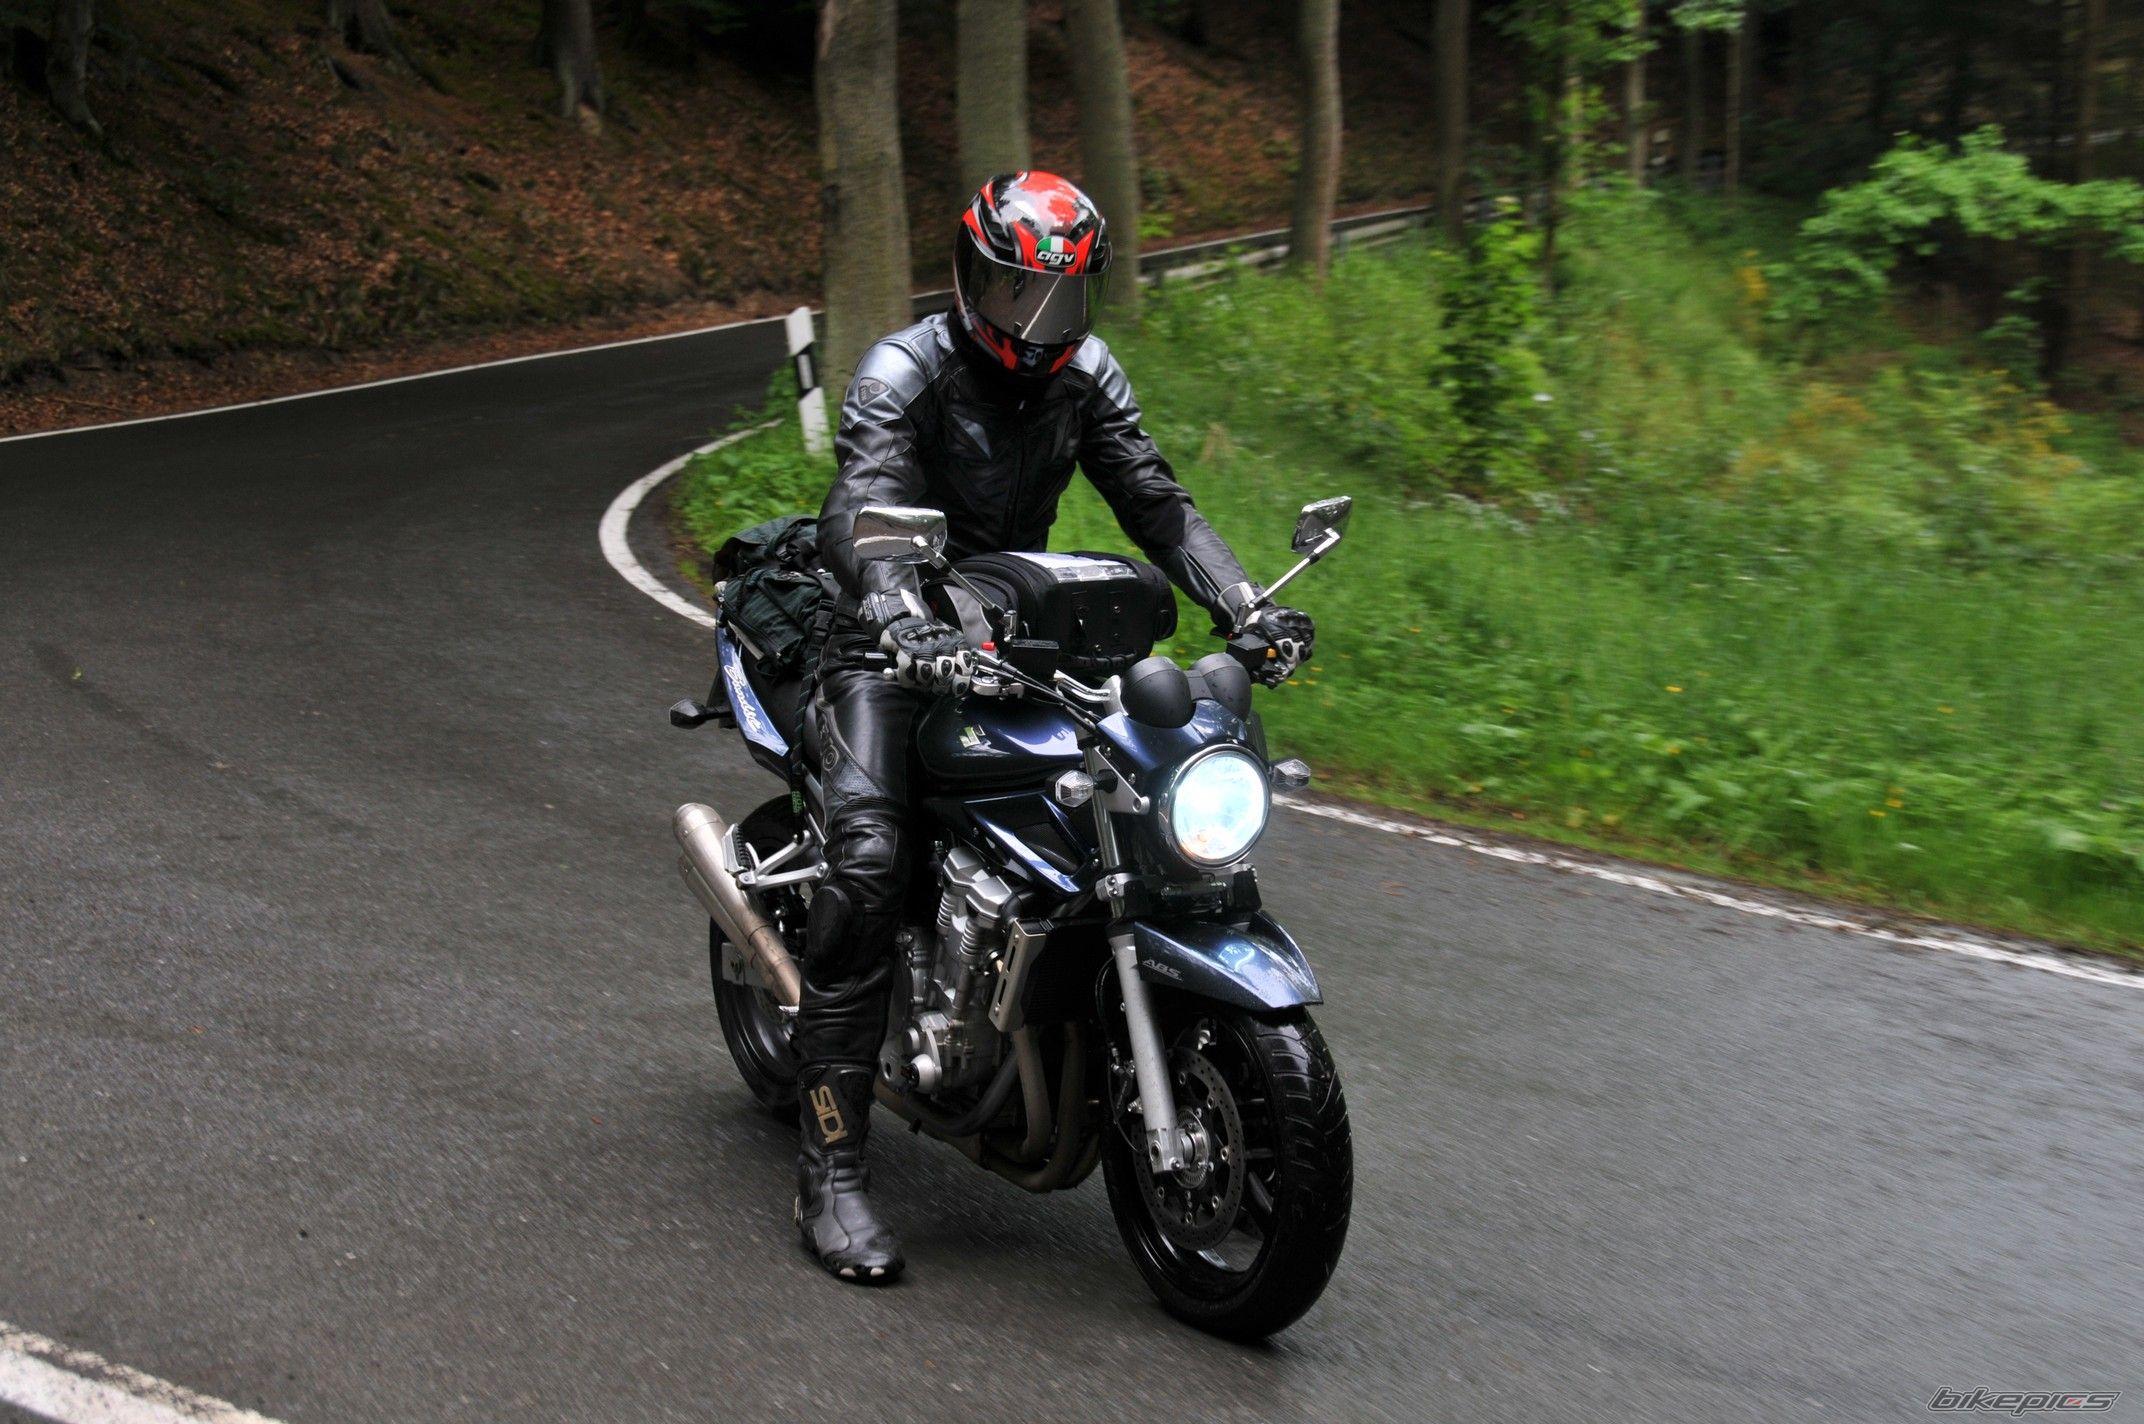 Тест-драйв мотоцикла Suzuki GSF1250 Bandit